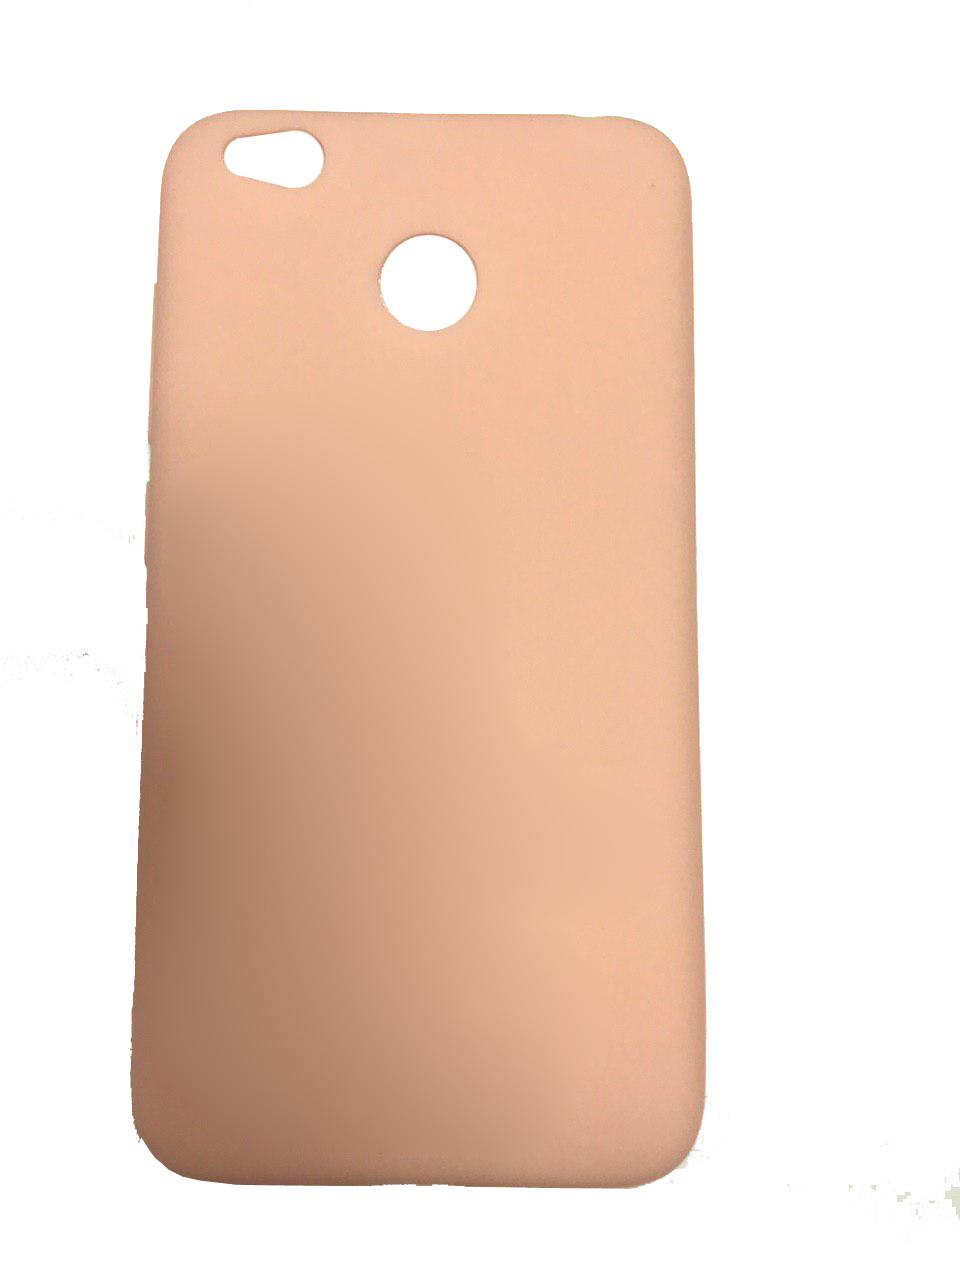 Чехол для Xiaomi Redmi 4A Чехол для Xiaomi Redmi 4A (Пудровый) leather case colorful flip cover for xiaomi redmi 4a white